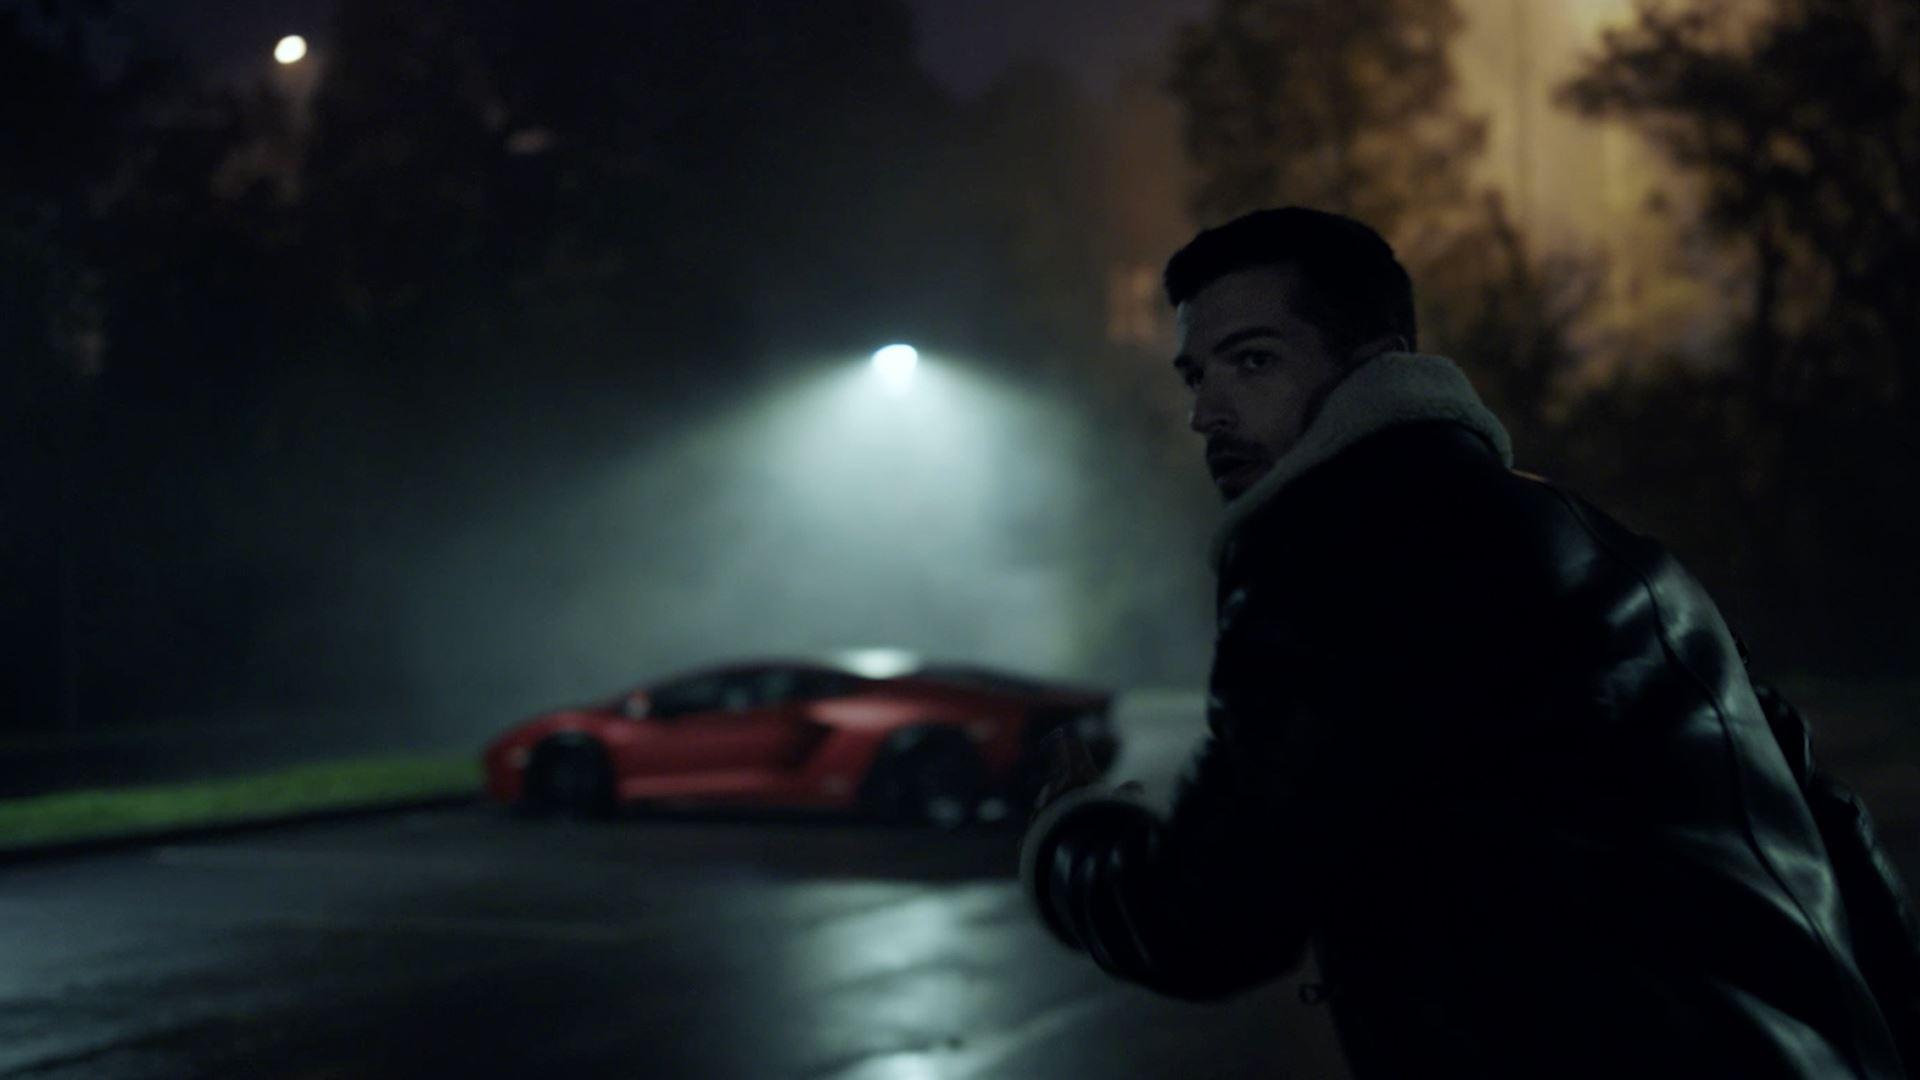 Automobili Lamborghini is on TikTok - Image 1